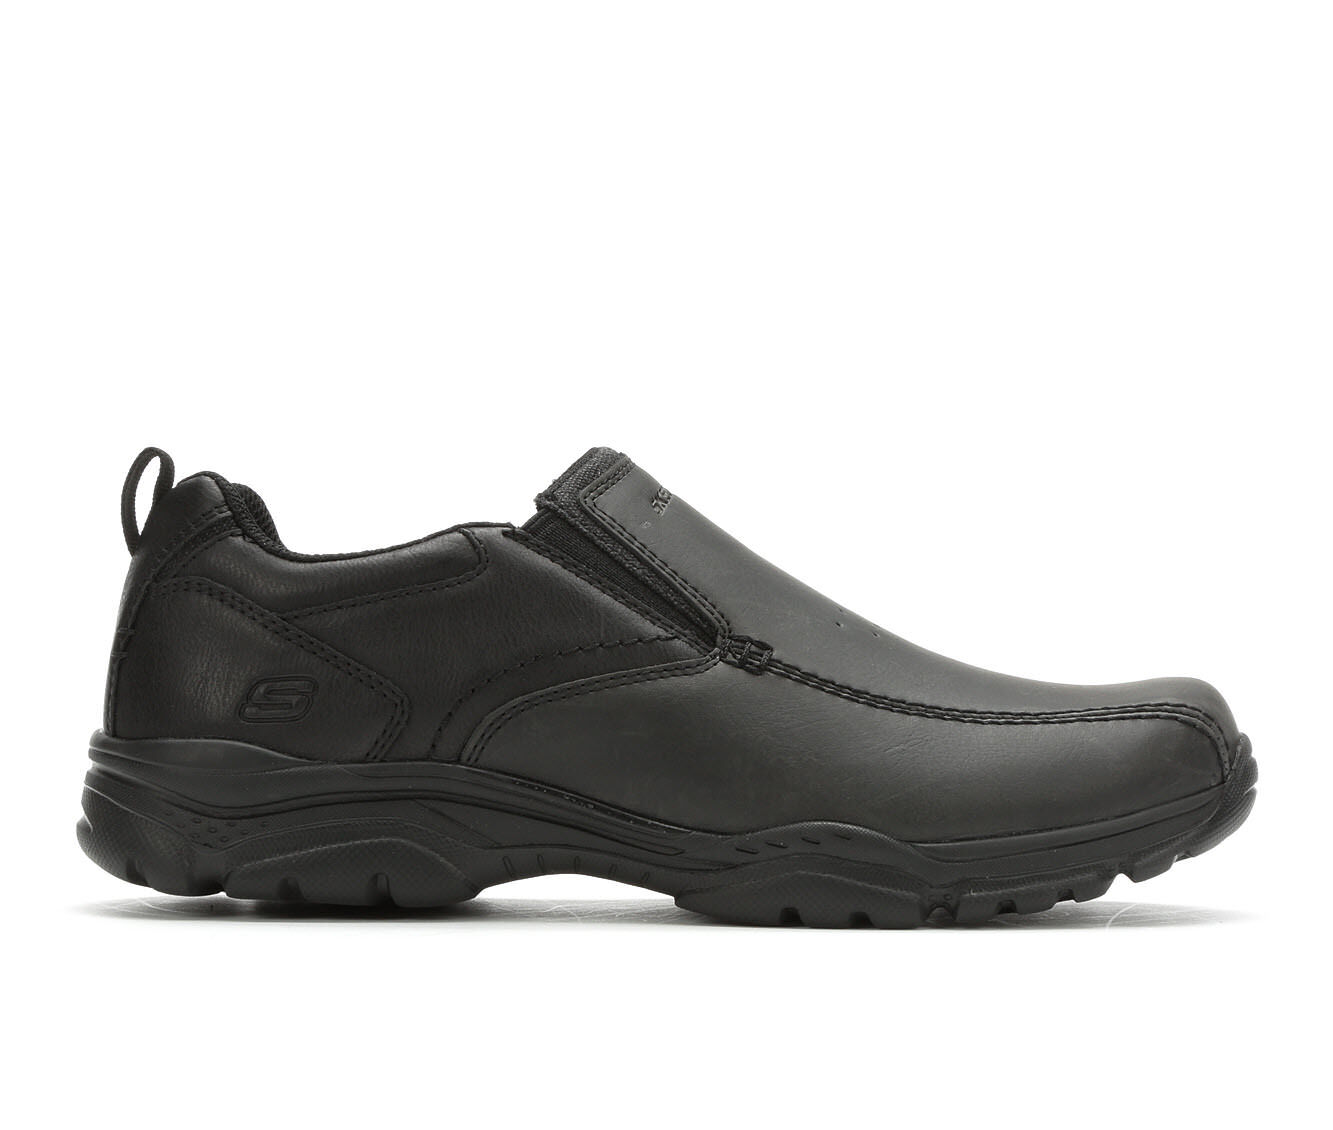 Men's Skechers Venten 65415 Casual Moc Loafers Black